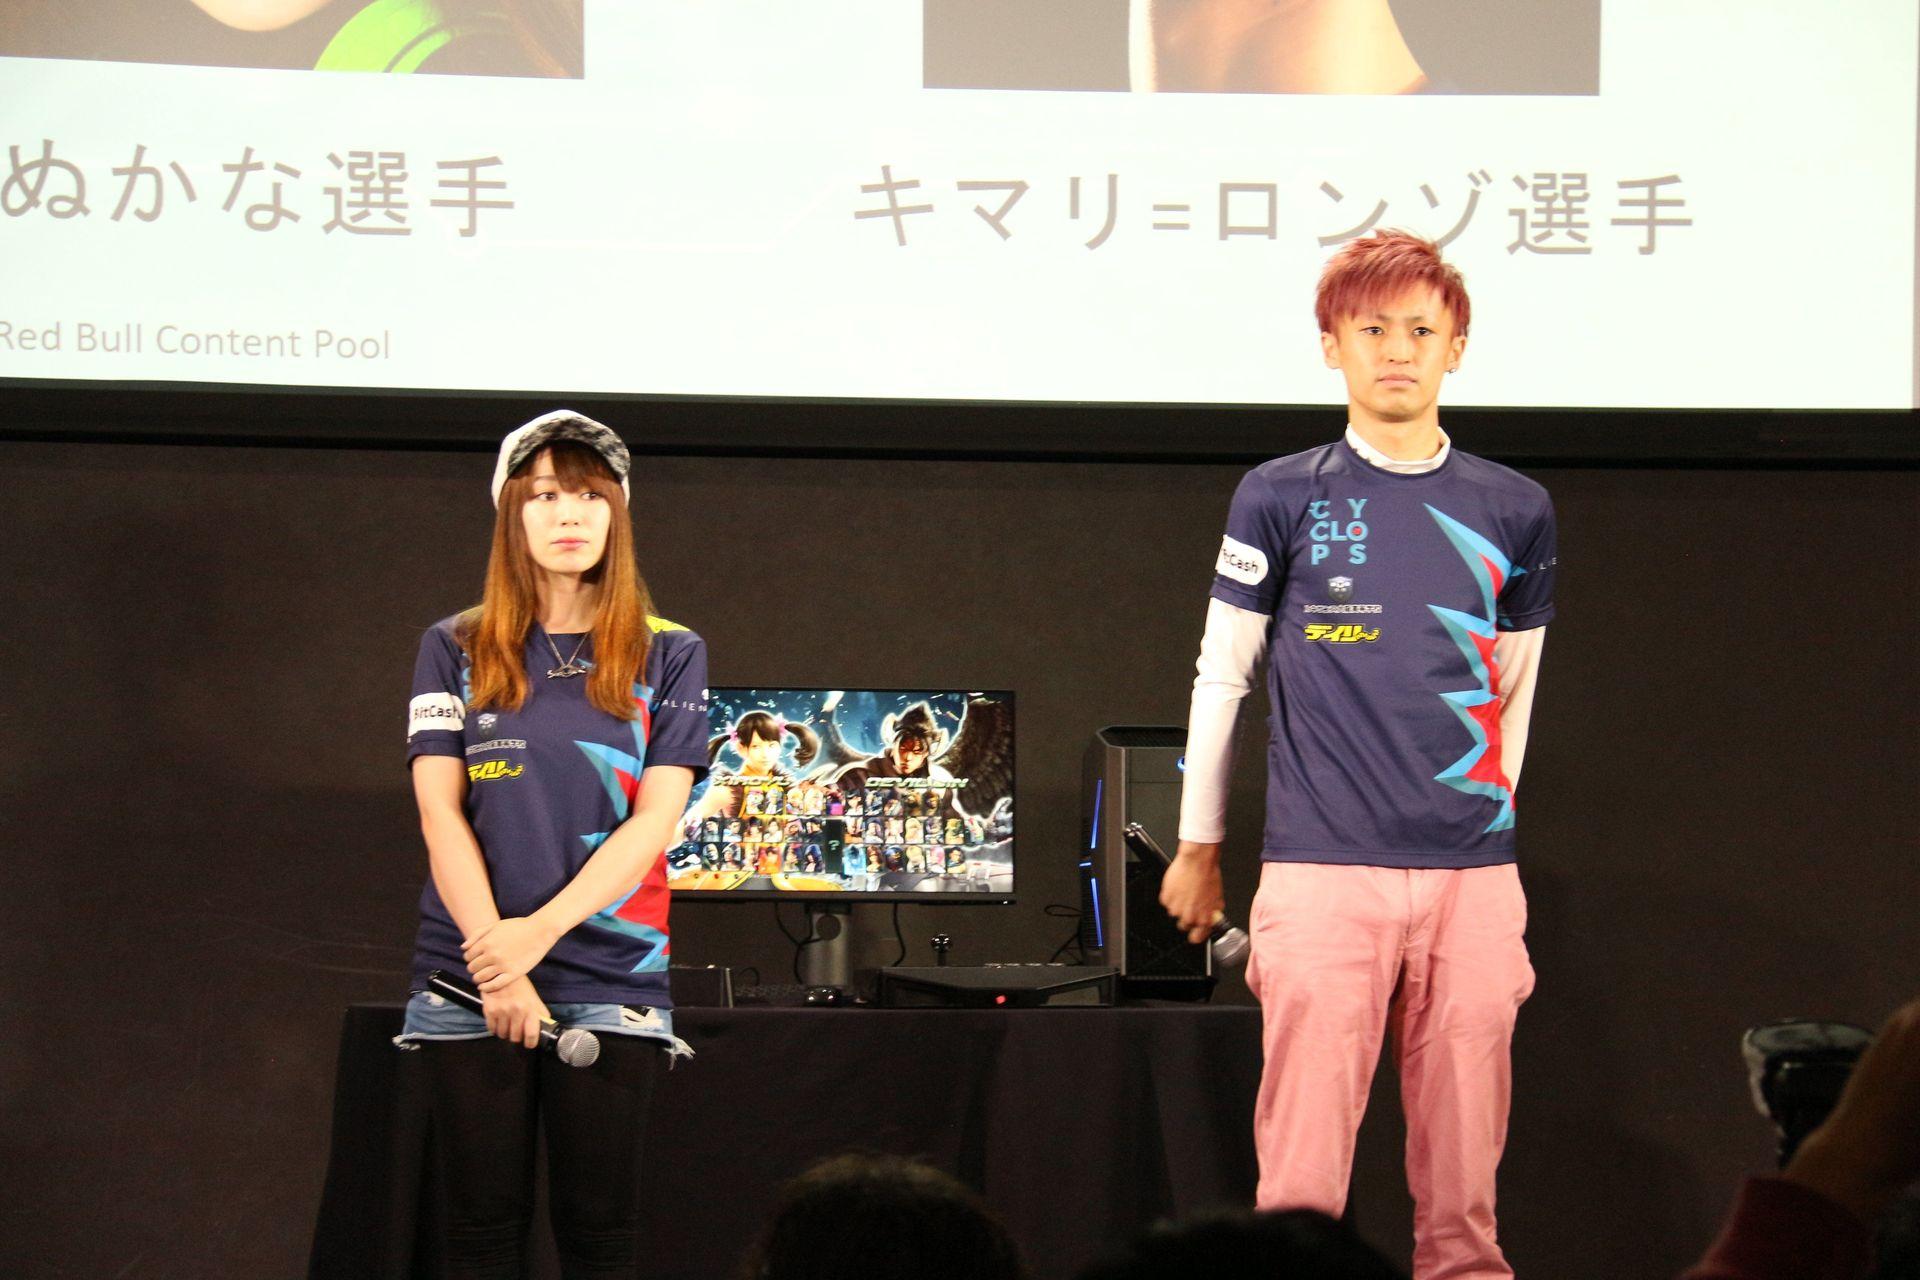 CYCLOPS athlete gamingの参加者。左よりオーナーの伊草雅幸氏、たぬかな選手、キマリ=ロンゾ選手